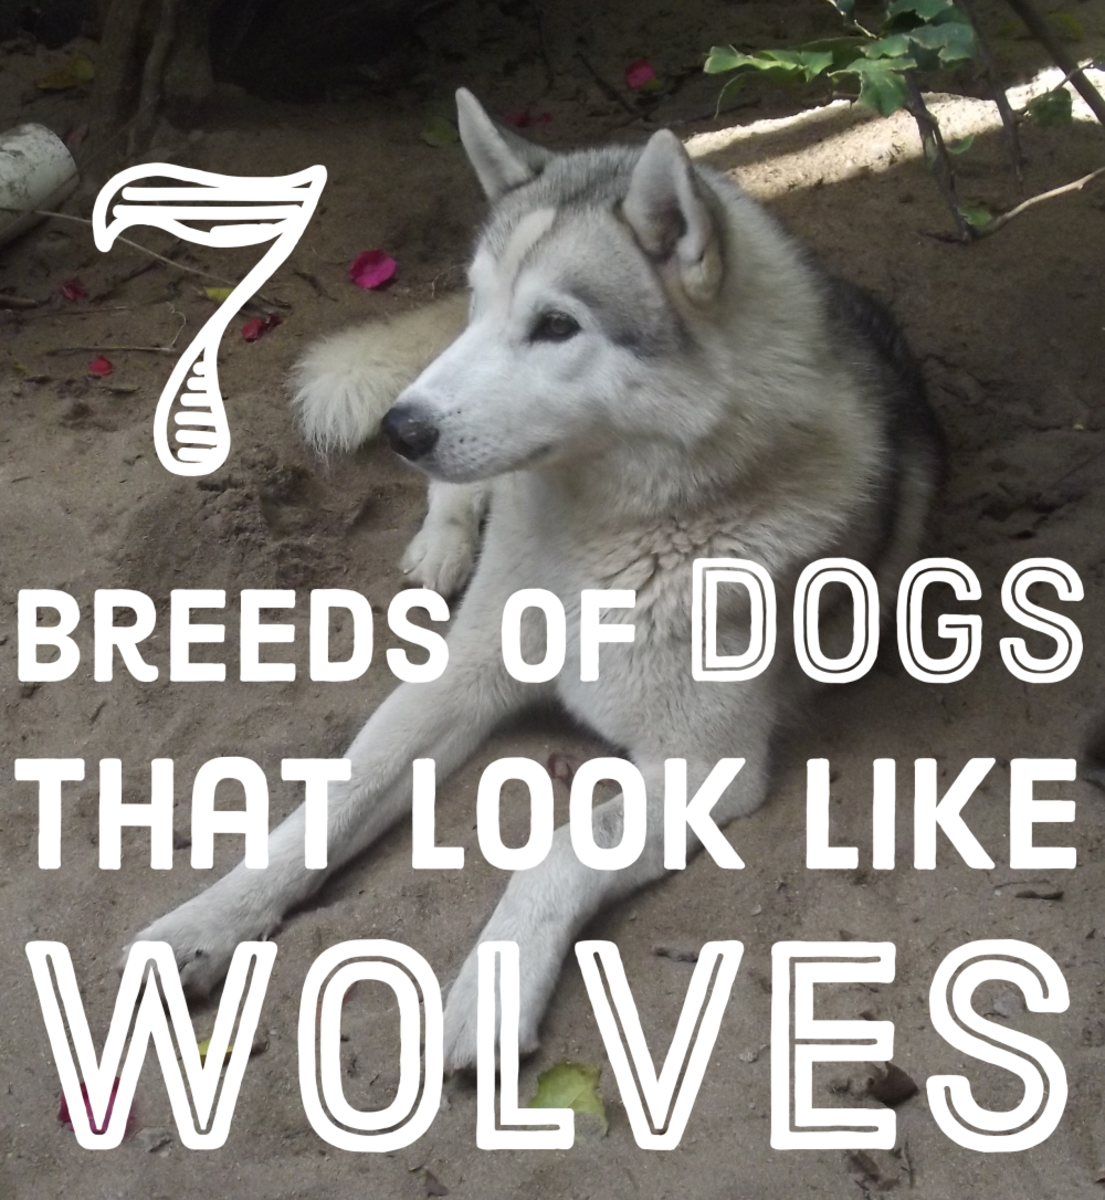 An Alaskan Malamute Siberian Husky cross: like a wolf